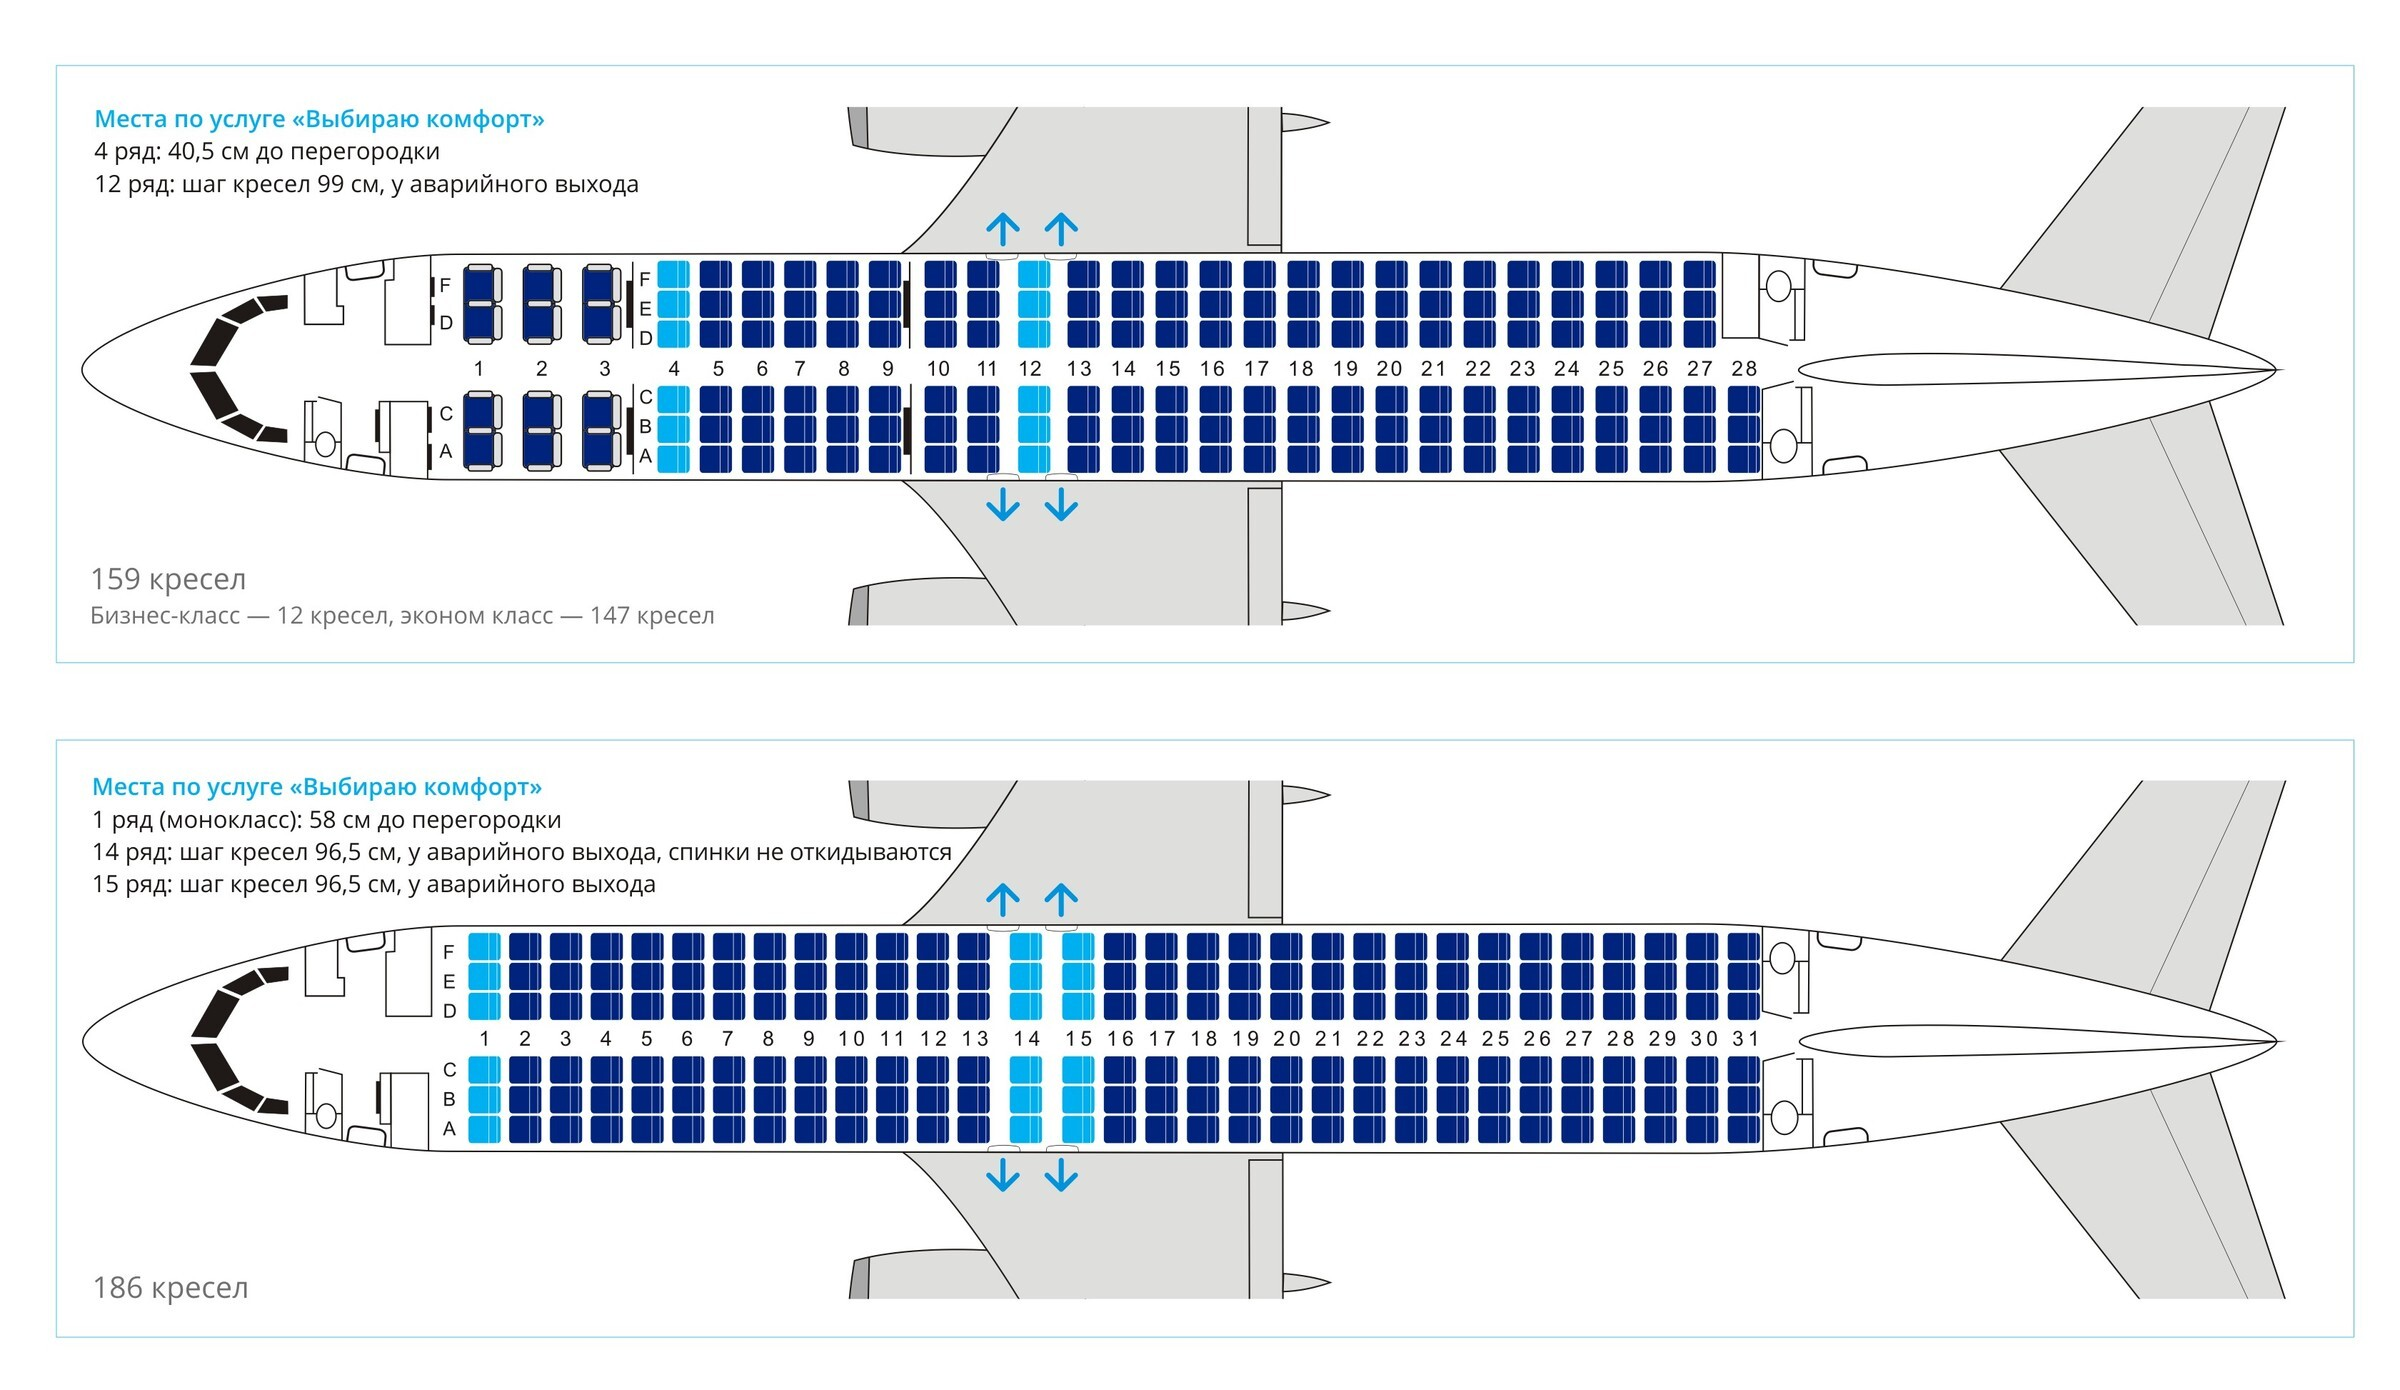 Боинг 737 схема салона лучшие места фото 70